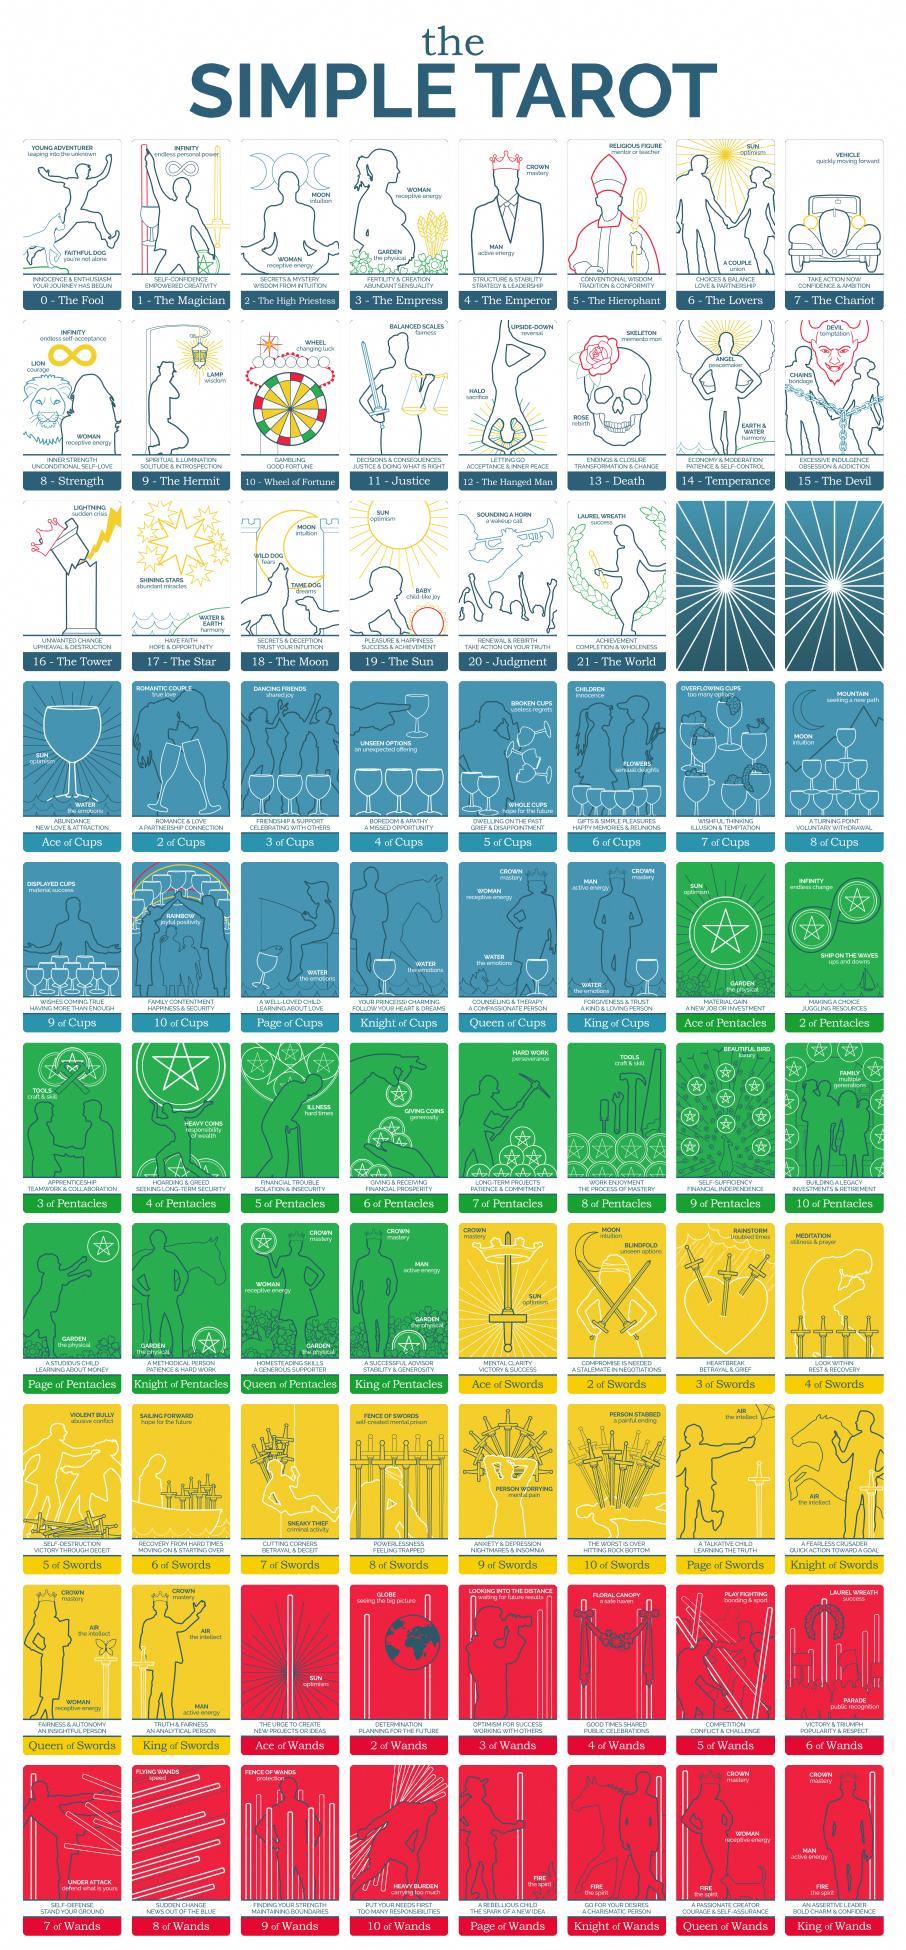 78 Tarot Cards for Beginners KXW Tarot Cards Set Surface Laser Tarot Deck with English Instructions Book